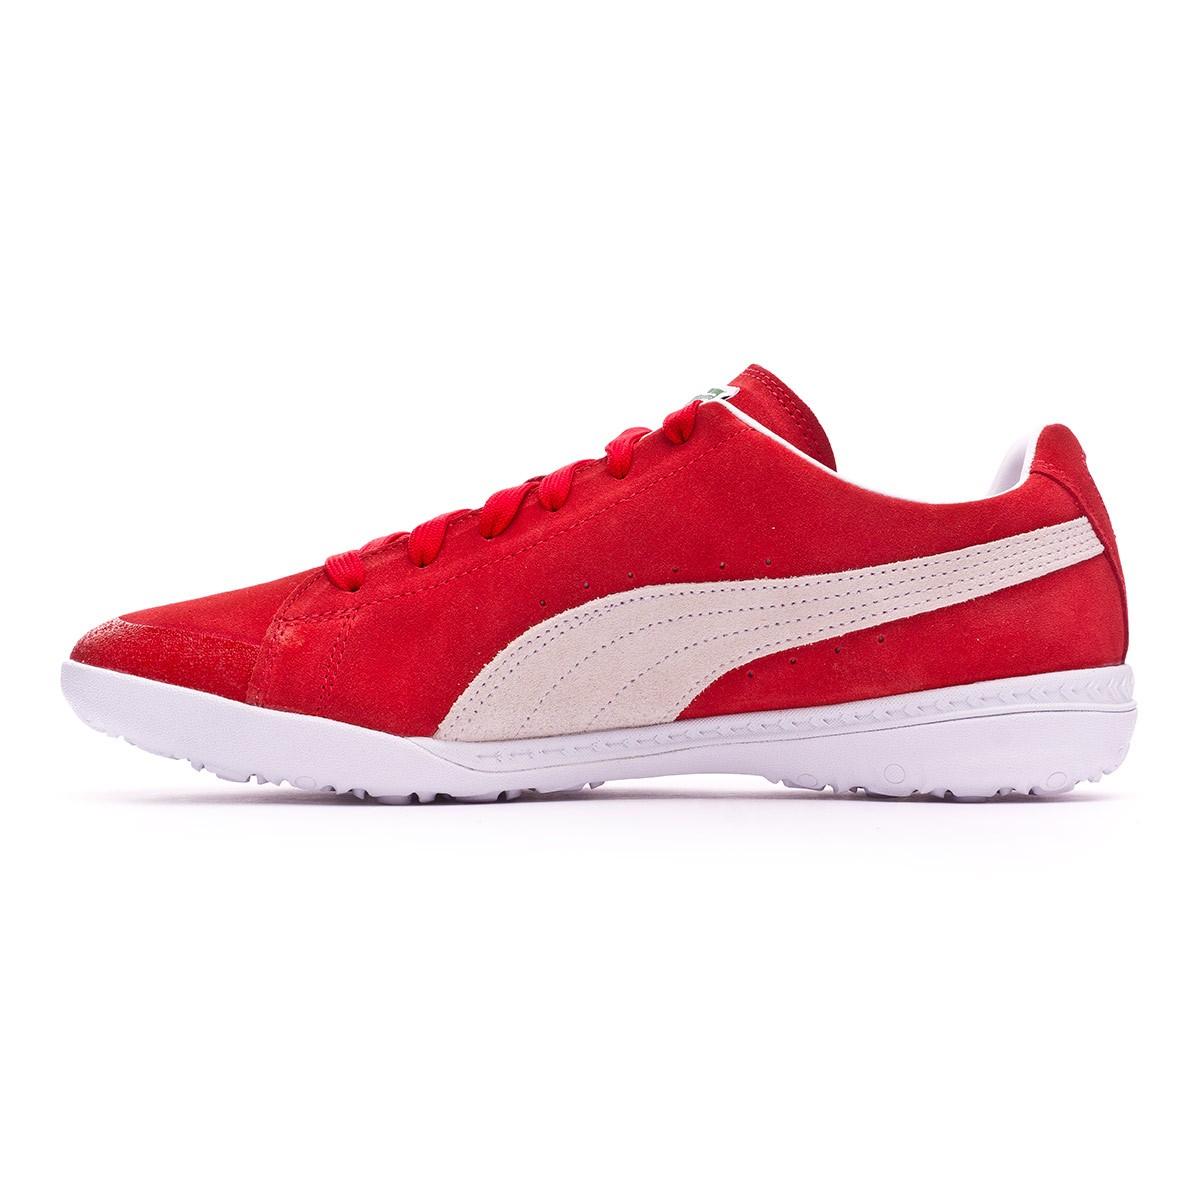 Puma FUTURE SUEDE 50 TT - Indoor football boots - red /white J8plI